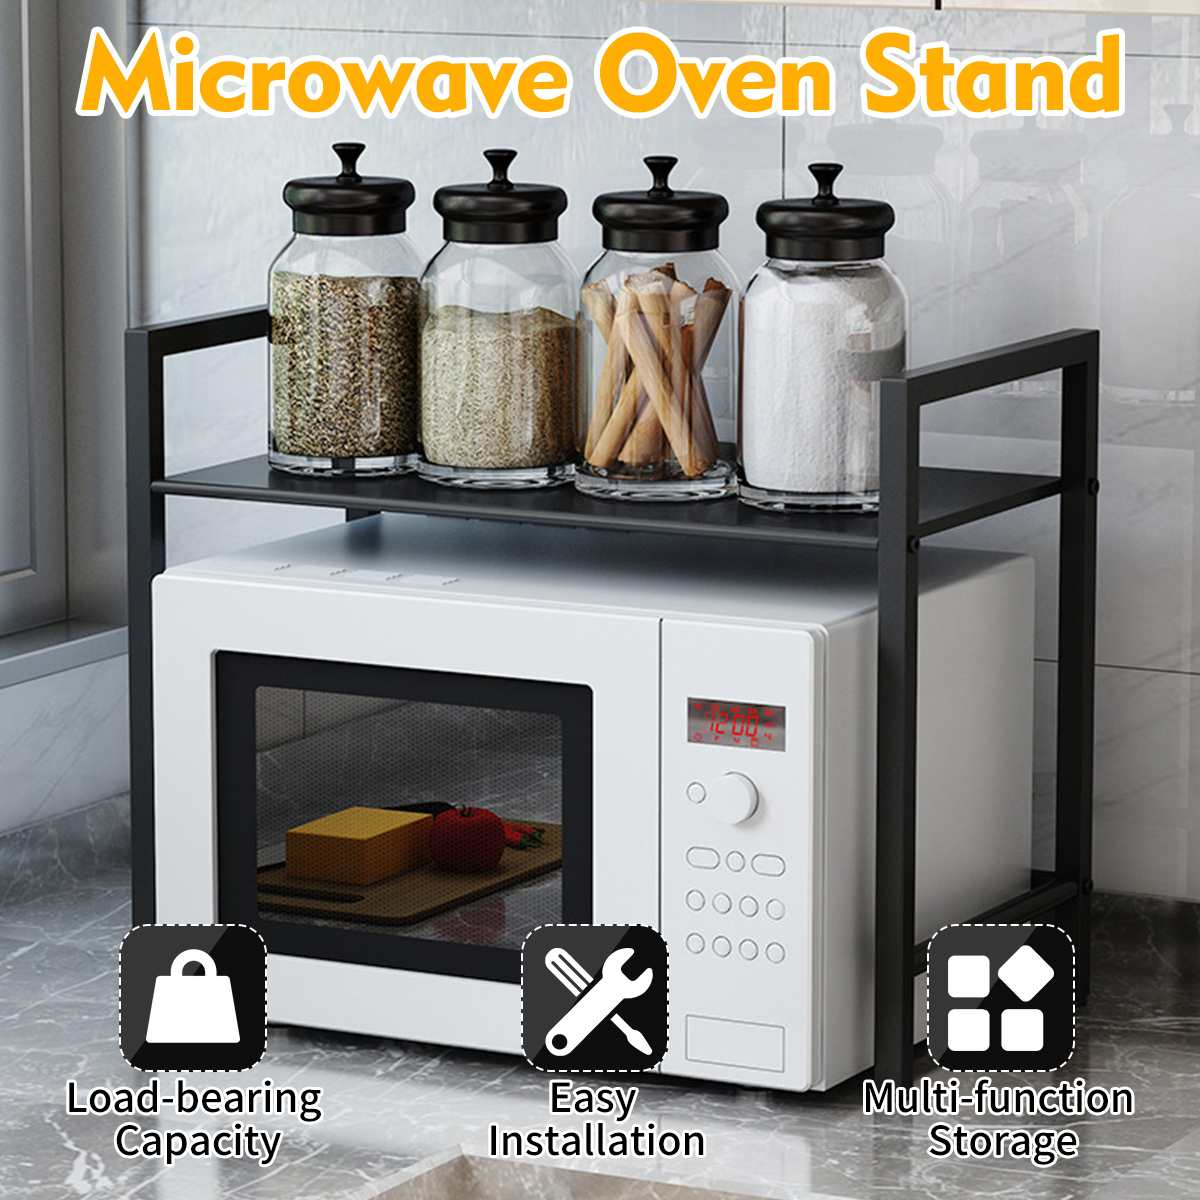 Kitchen Microwave Oven Shelf Rack Standing Metal Multi Function  Home Storage Holders Kitchen Shelf Organizer Space Saving